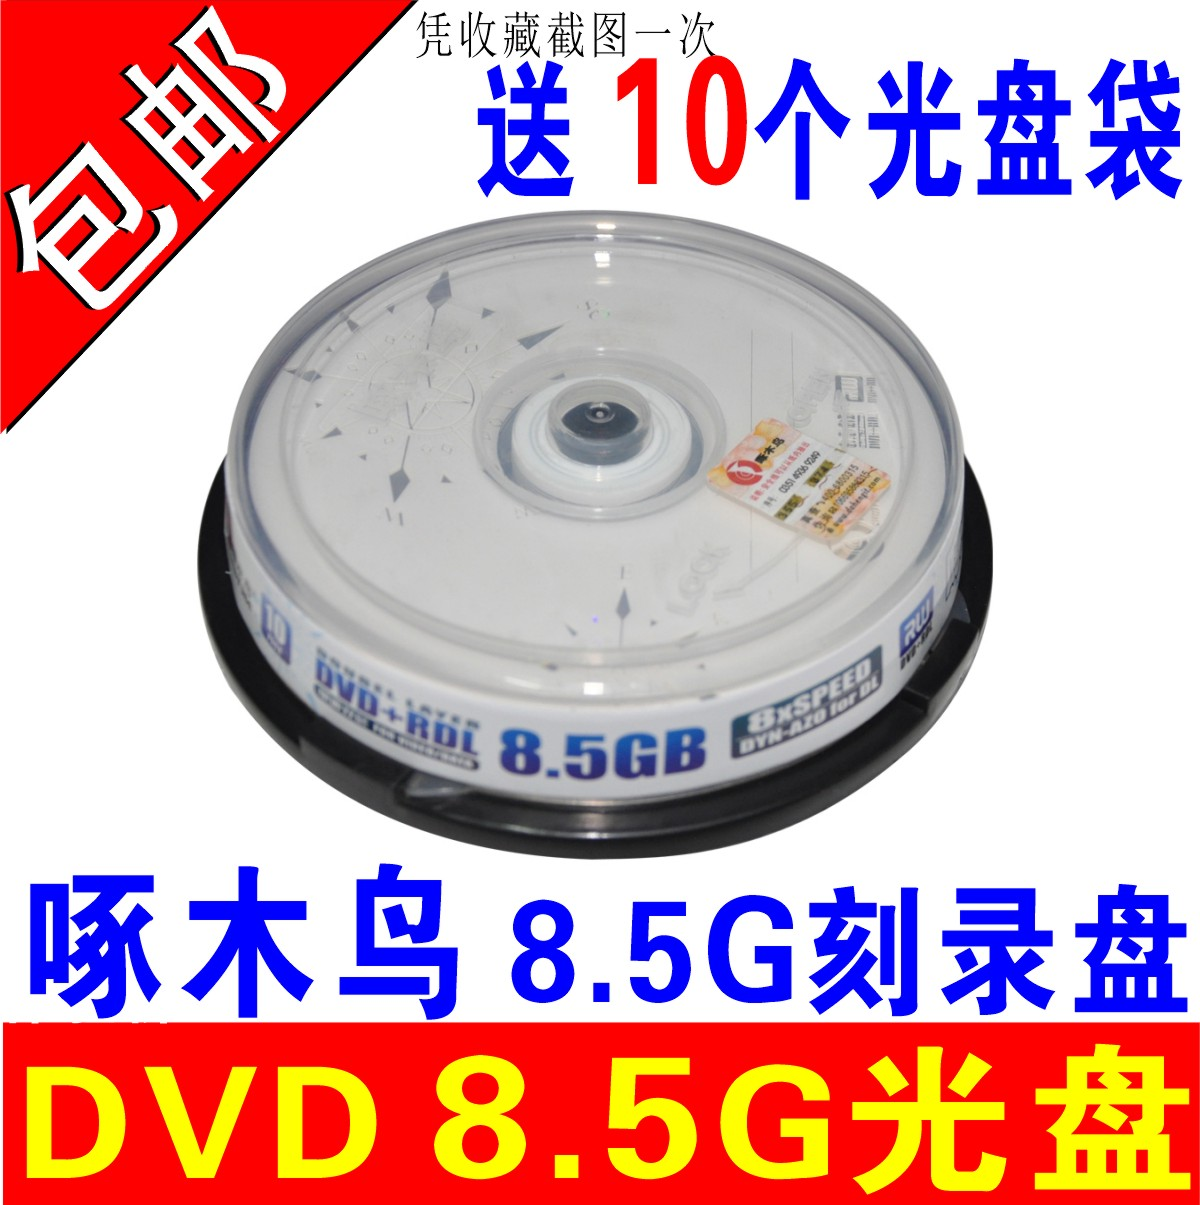 啄木鸟8.5G光盘dvd8.5G刻录盘DL/D9刻录光盘8G盘大容量D9光盘10片